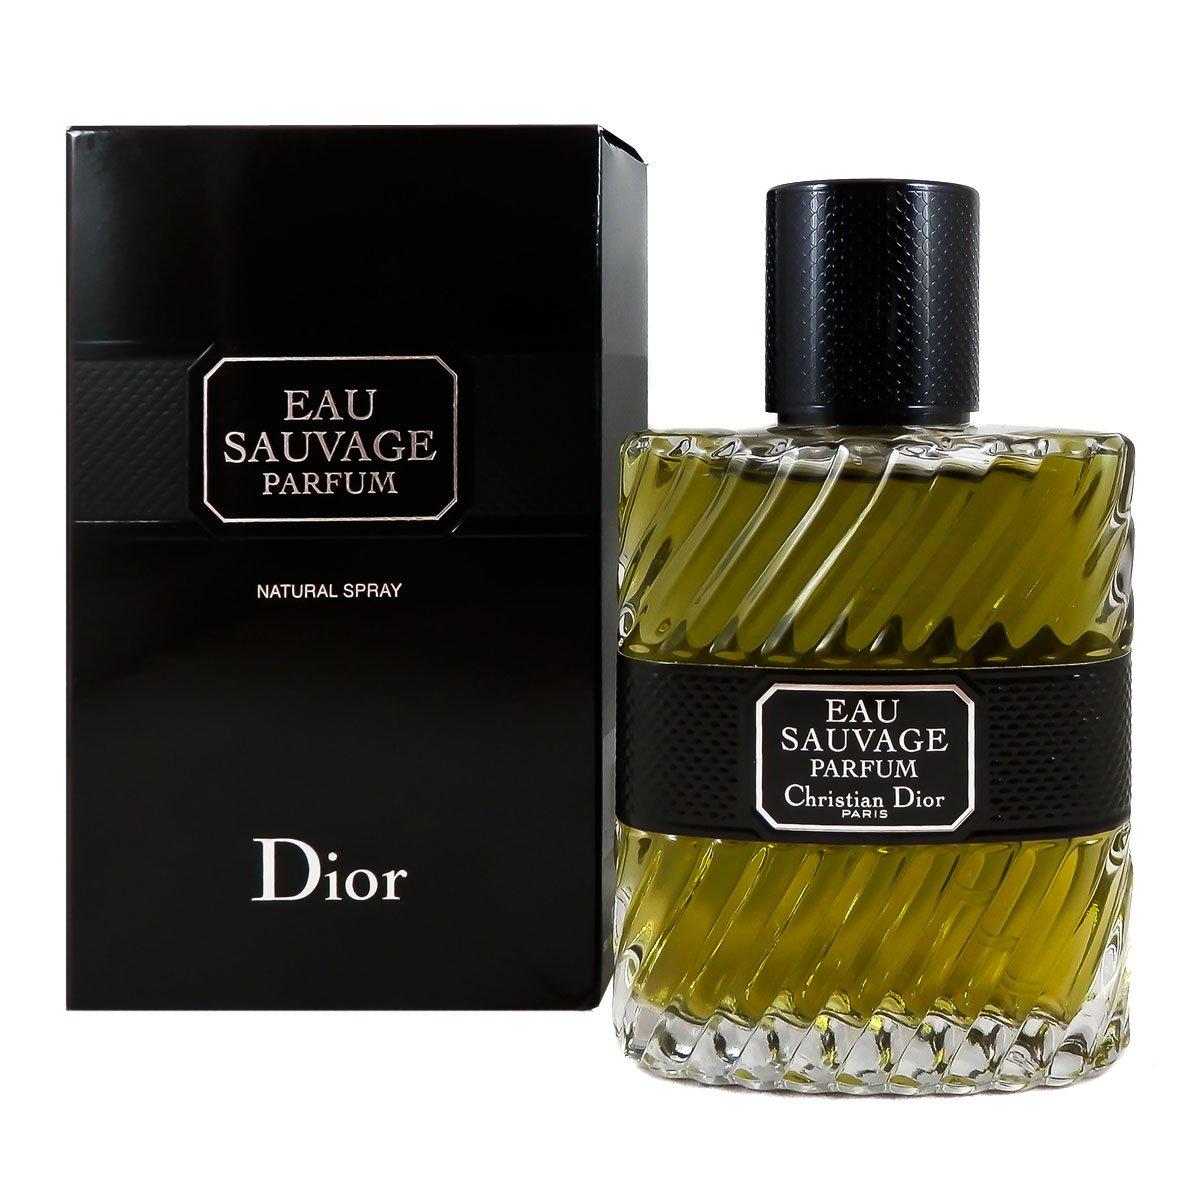 Christian Dior Eau Sauvage Parfum Spray for Men, 1.7 Ounce